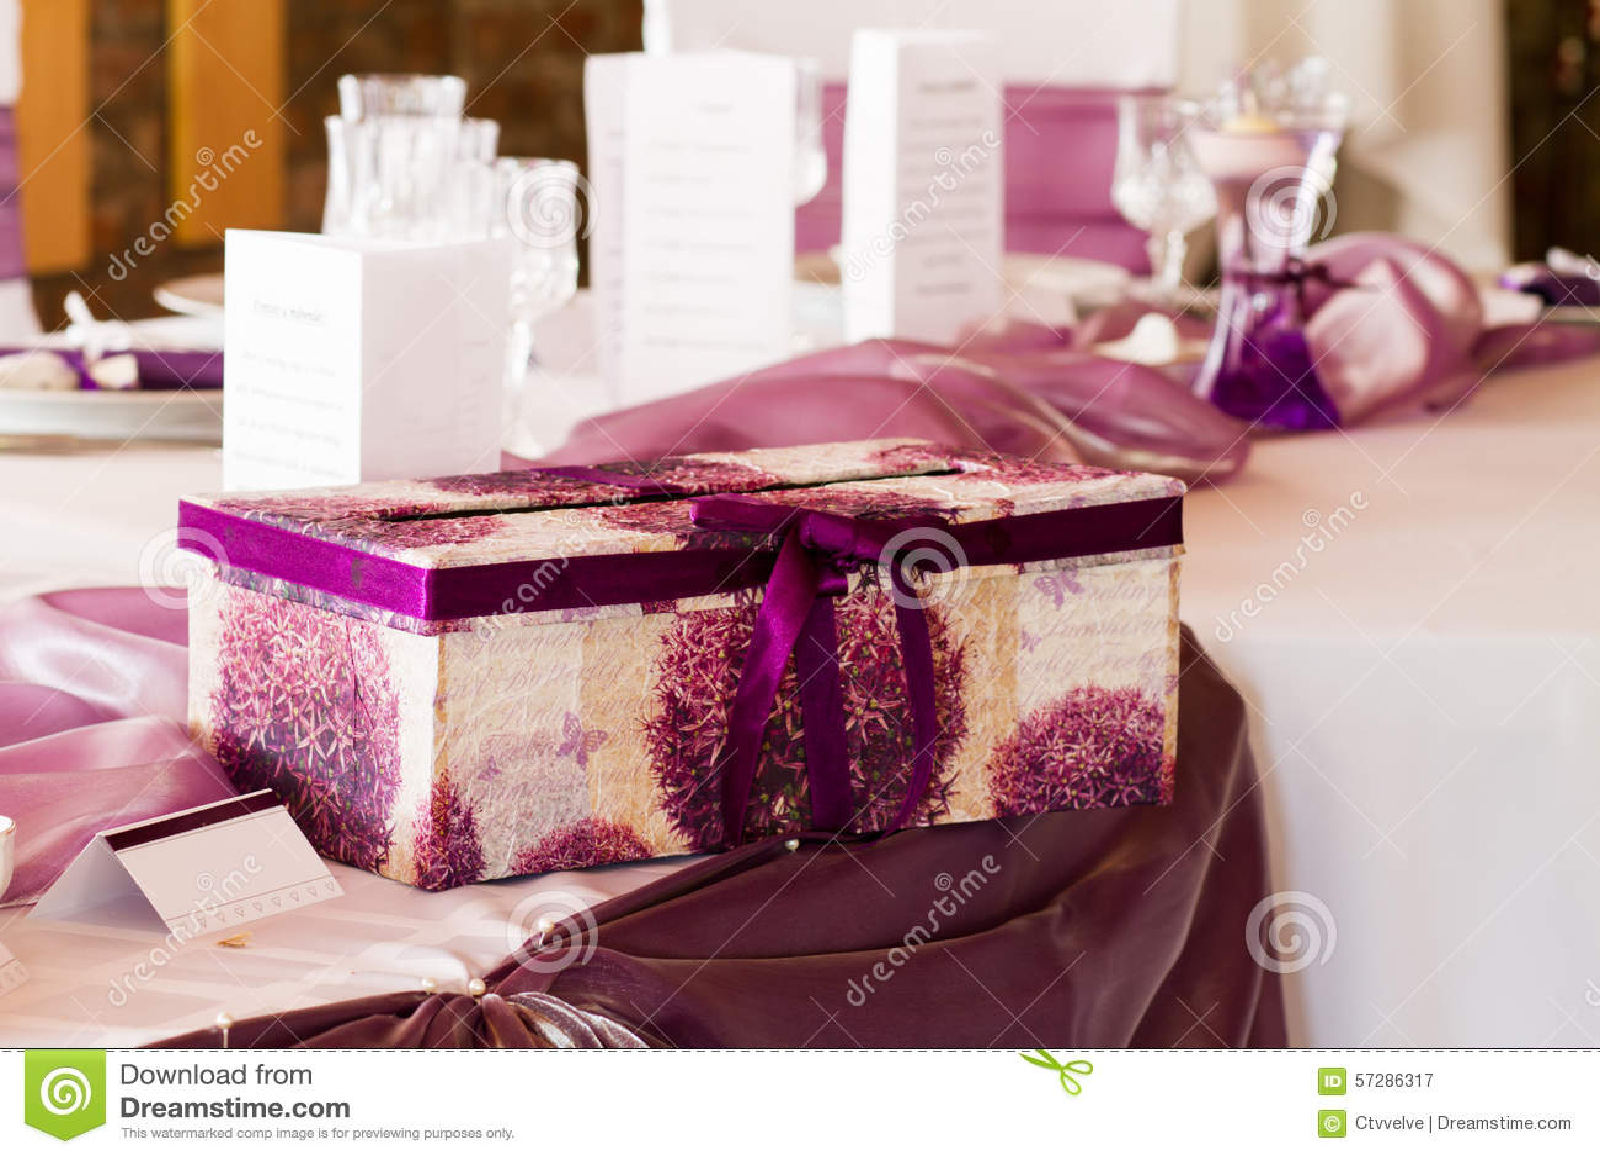 Wedding table with giftbox stock image. Image of elegant - 57286317